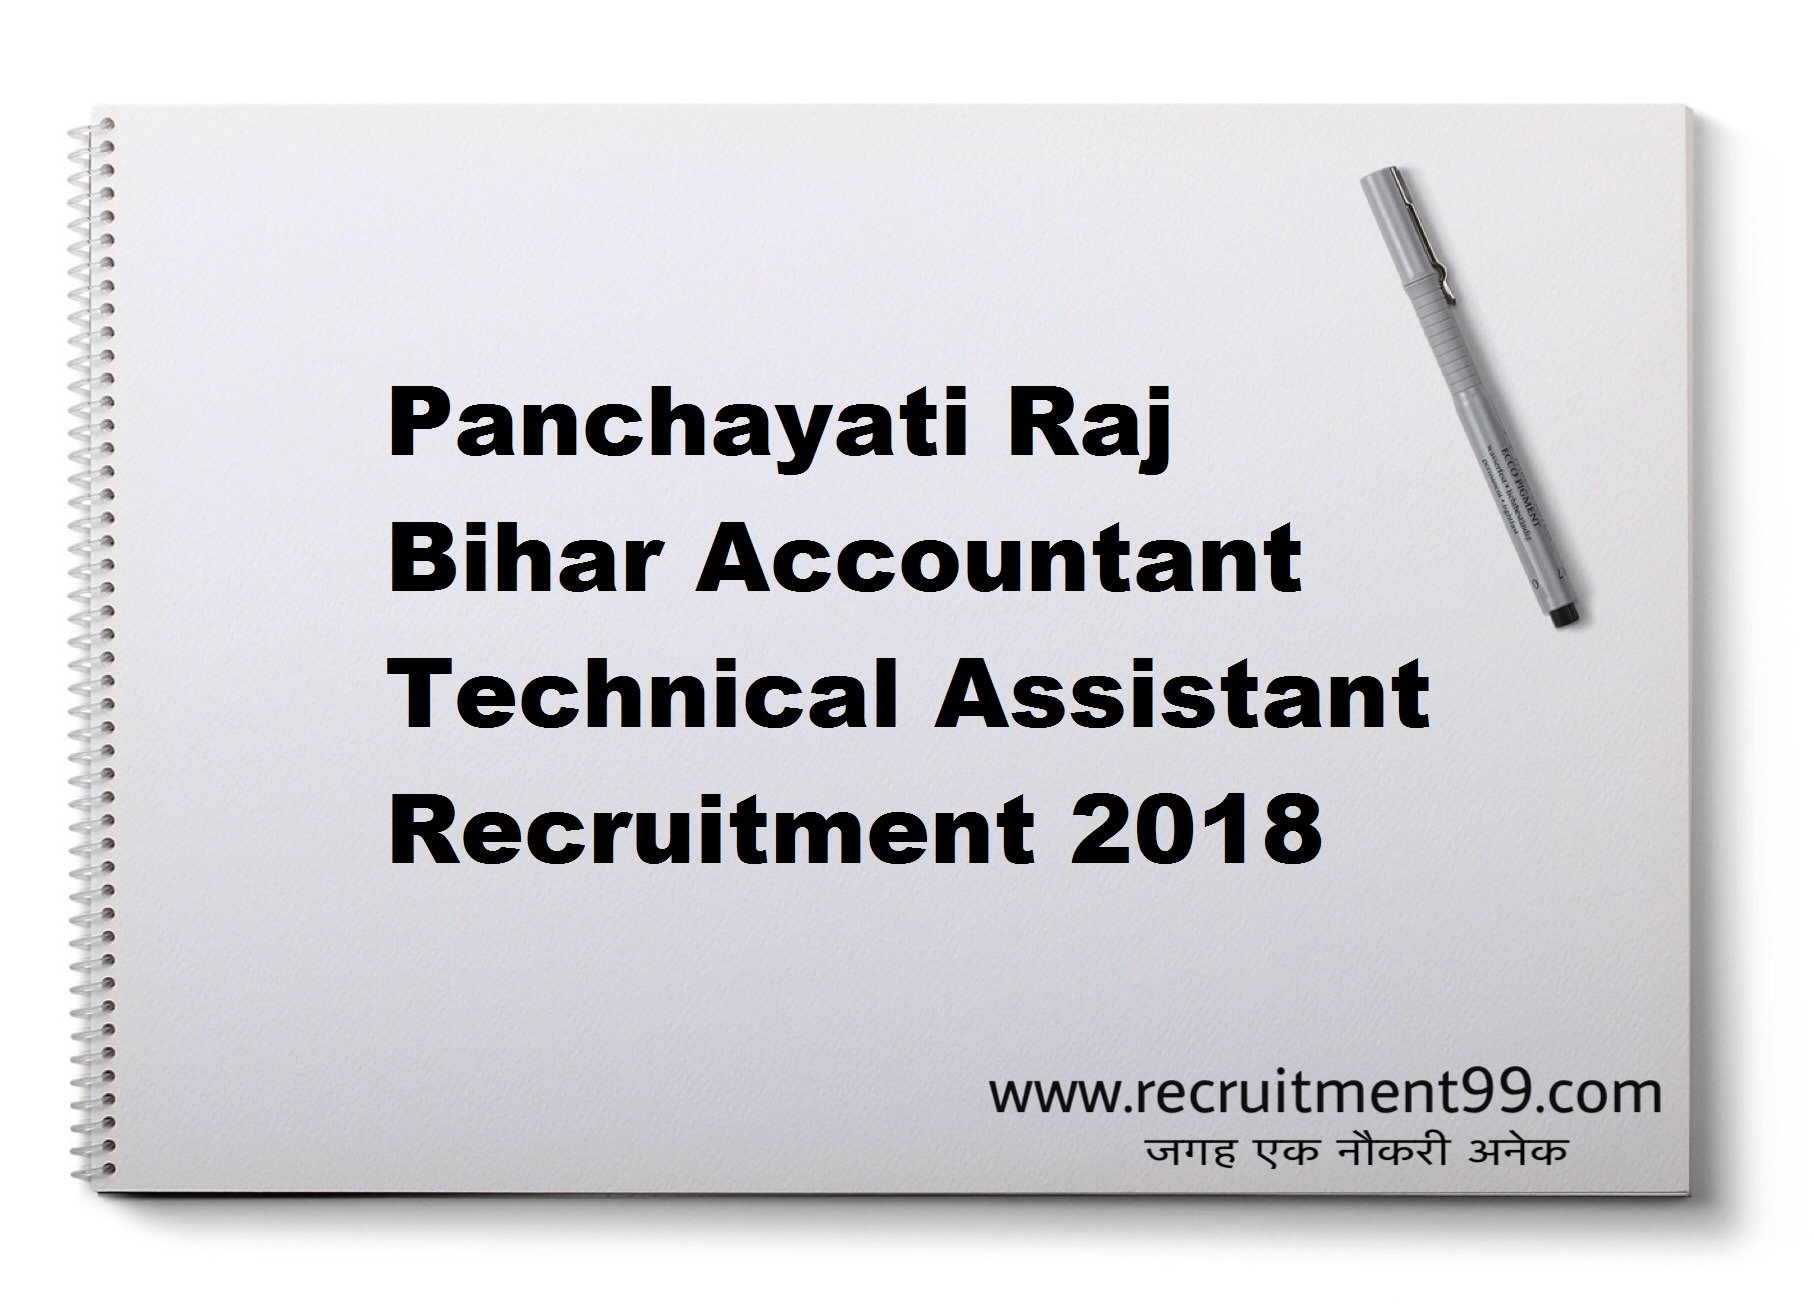 Panchayati Raj Bihar Accountant Technical Assistant Recruitment Admit Card Result 2018